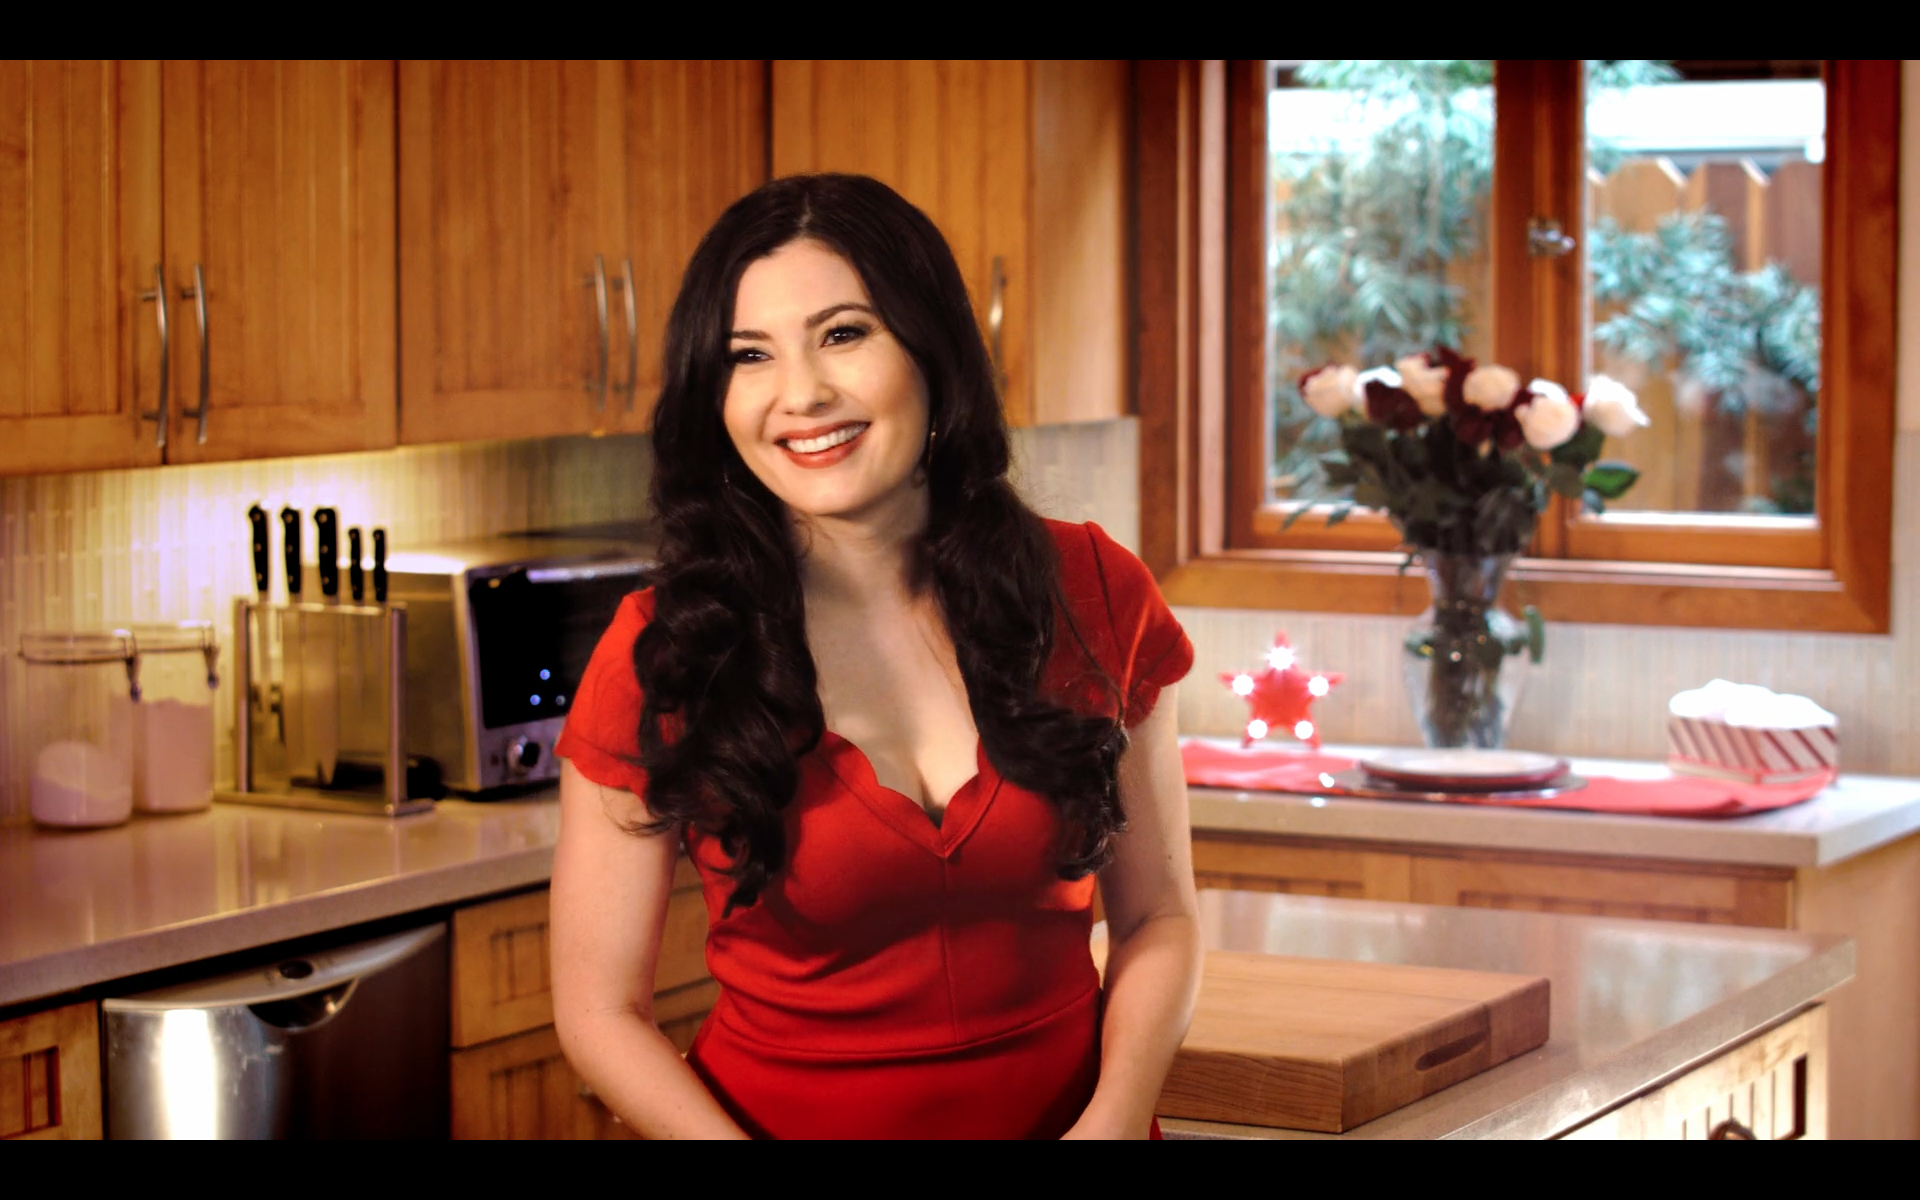 Celeste Thorson\'s Comedy Show Rosa\'s Kitchen Makes an Impact on ...